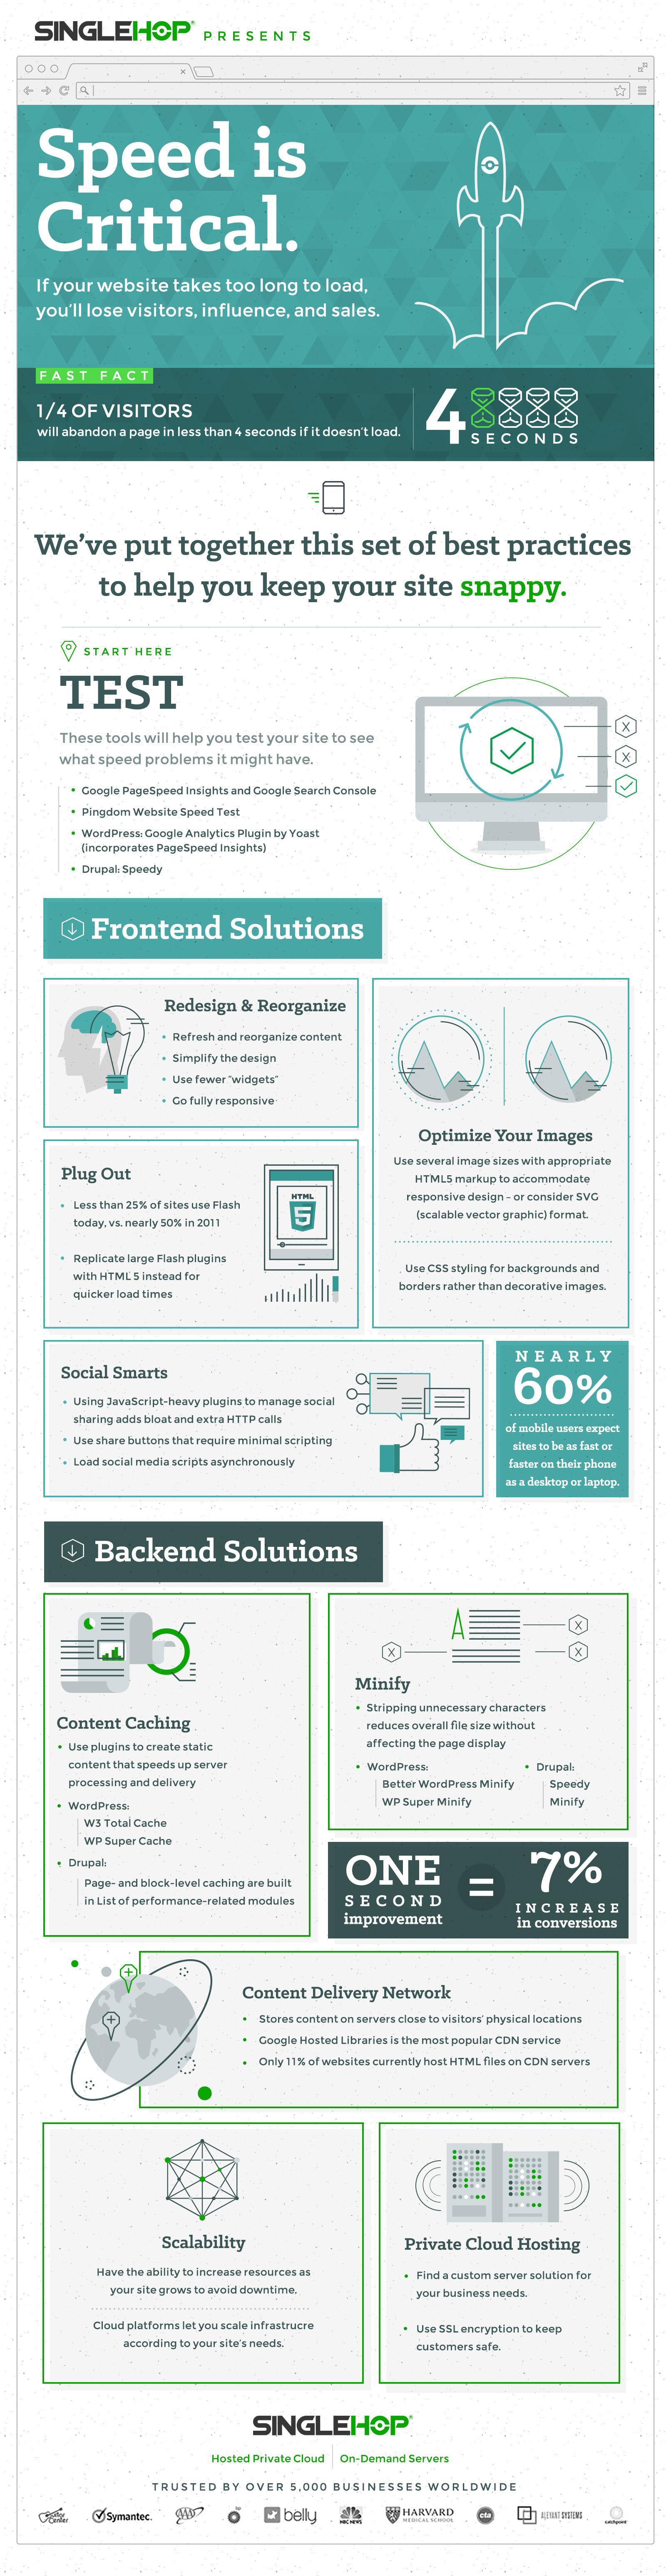 singlehop_speed_infographic